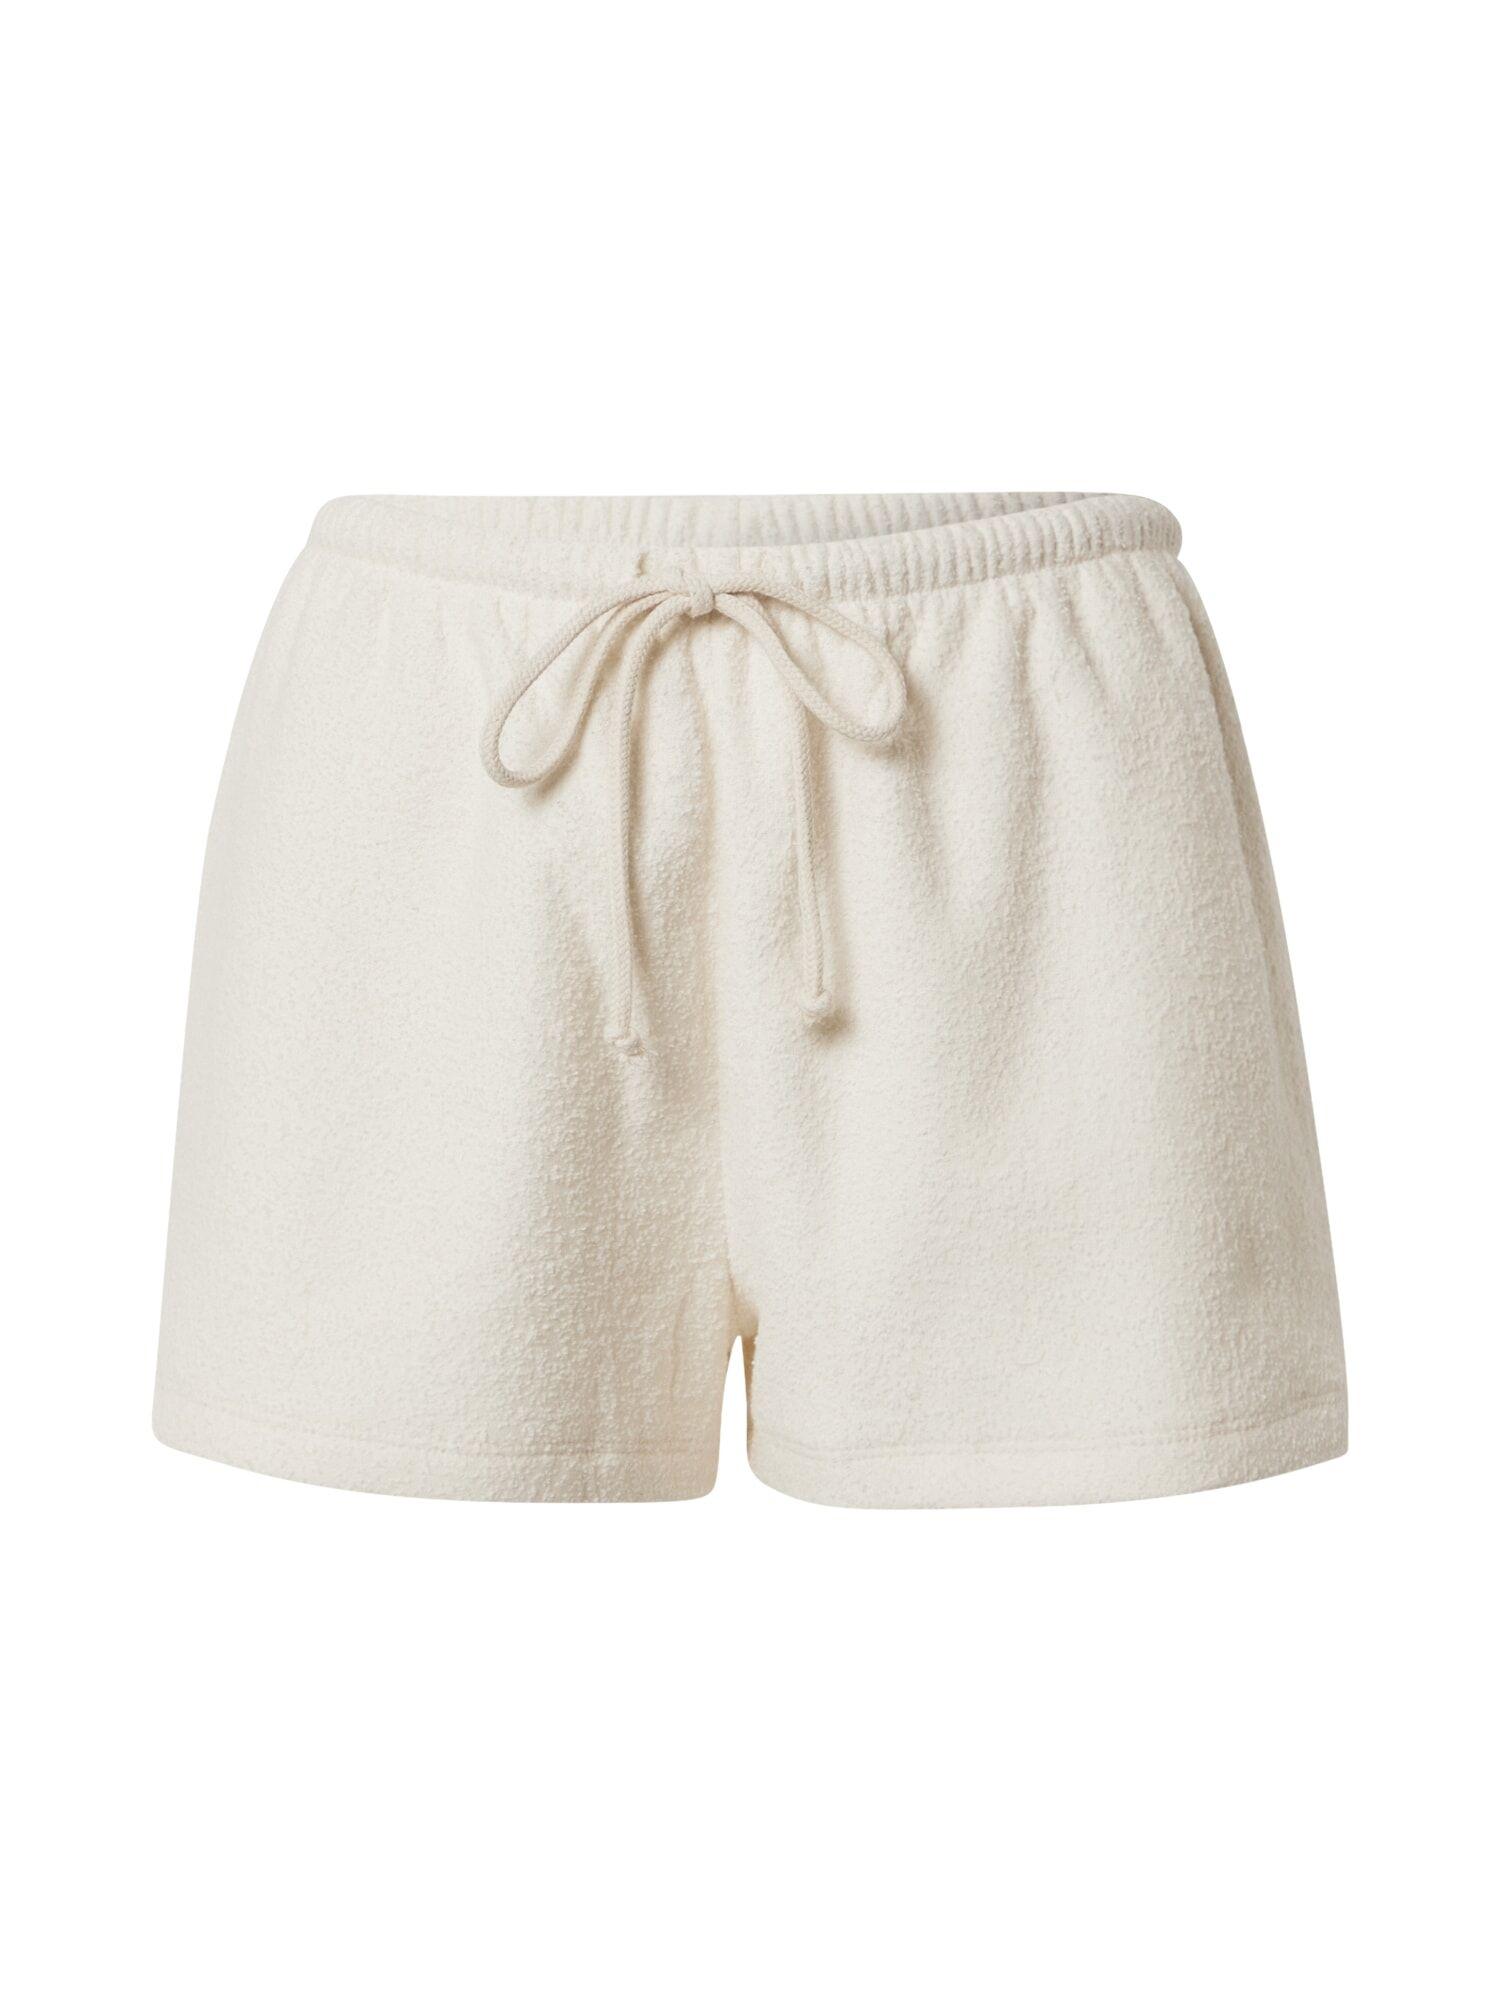 AMERICAN VINTAGE Pantalon 'BOBY09A'  - Beige - Taille: S - female